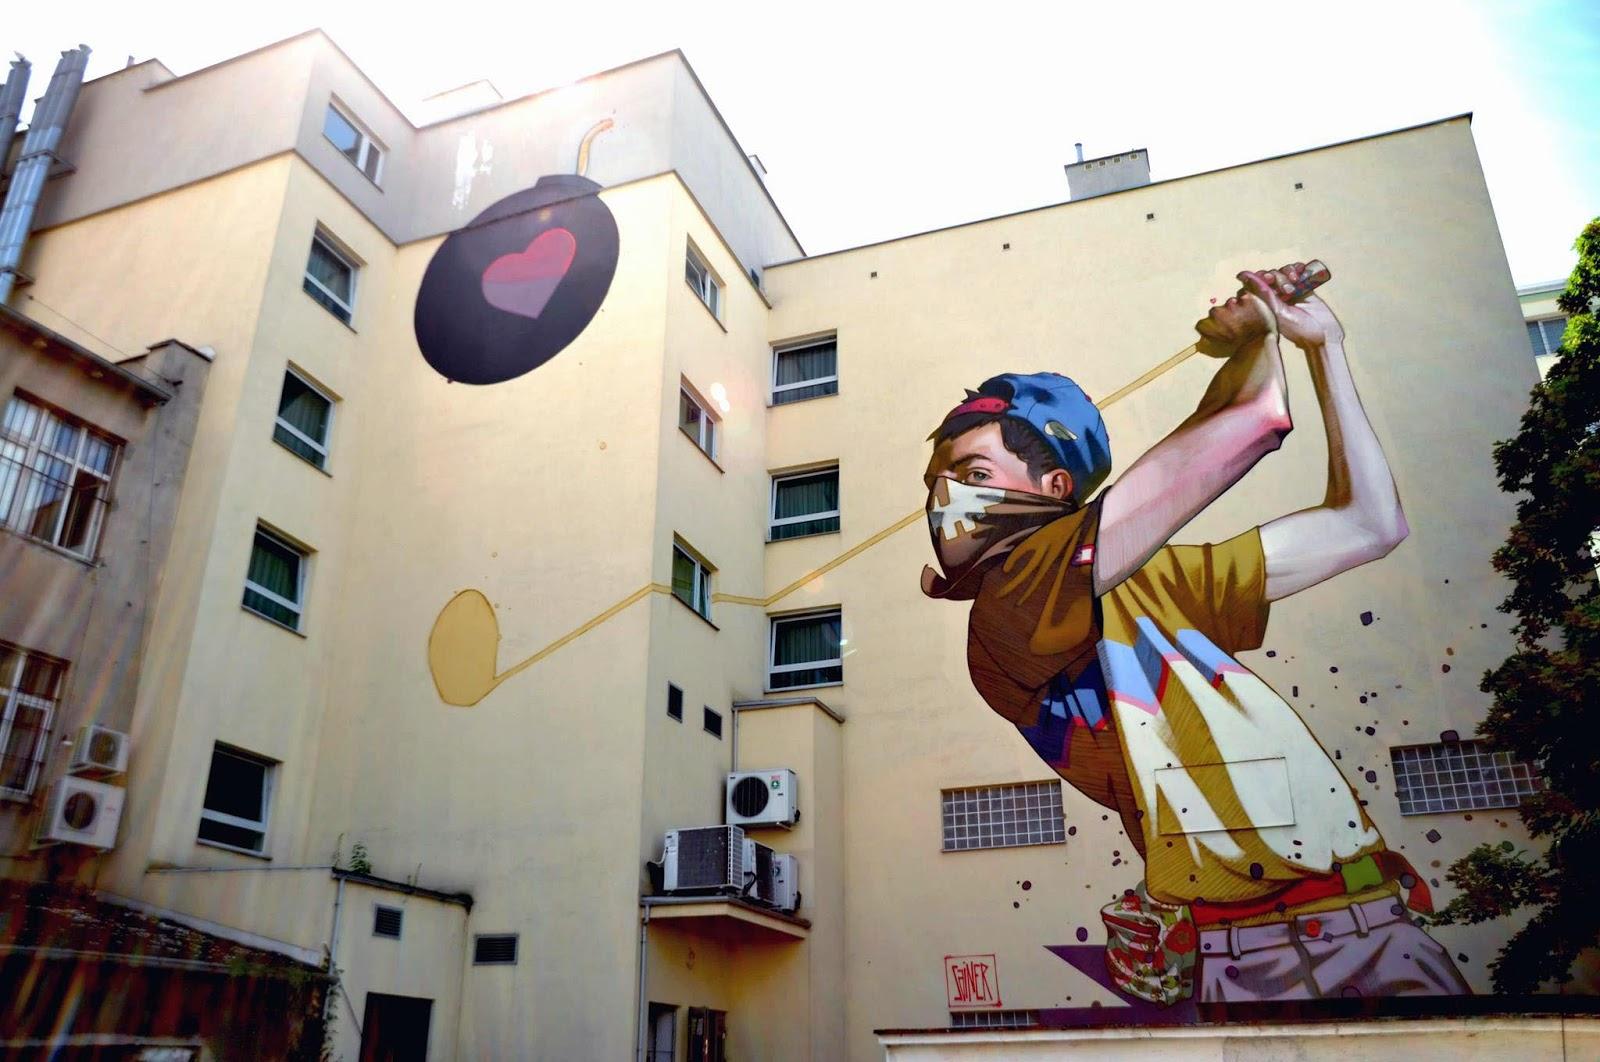 etam-cru-bezt-sainer-street-art-large-murals-21